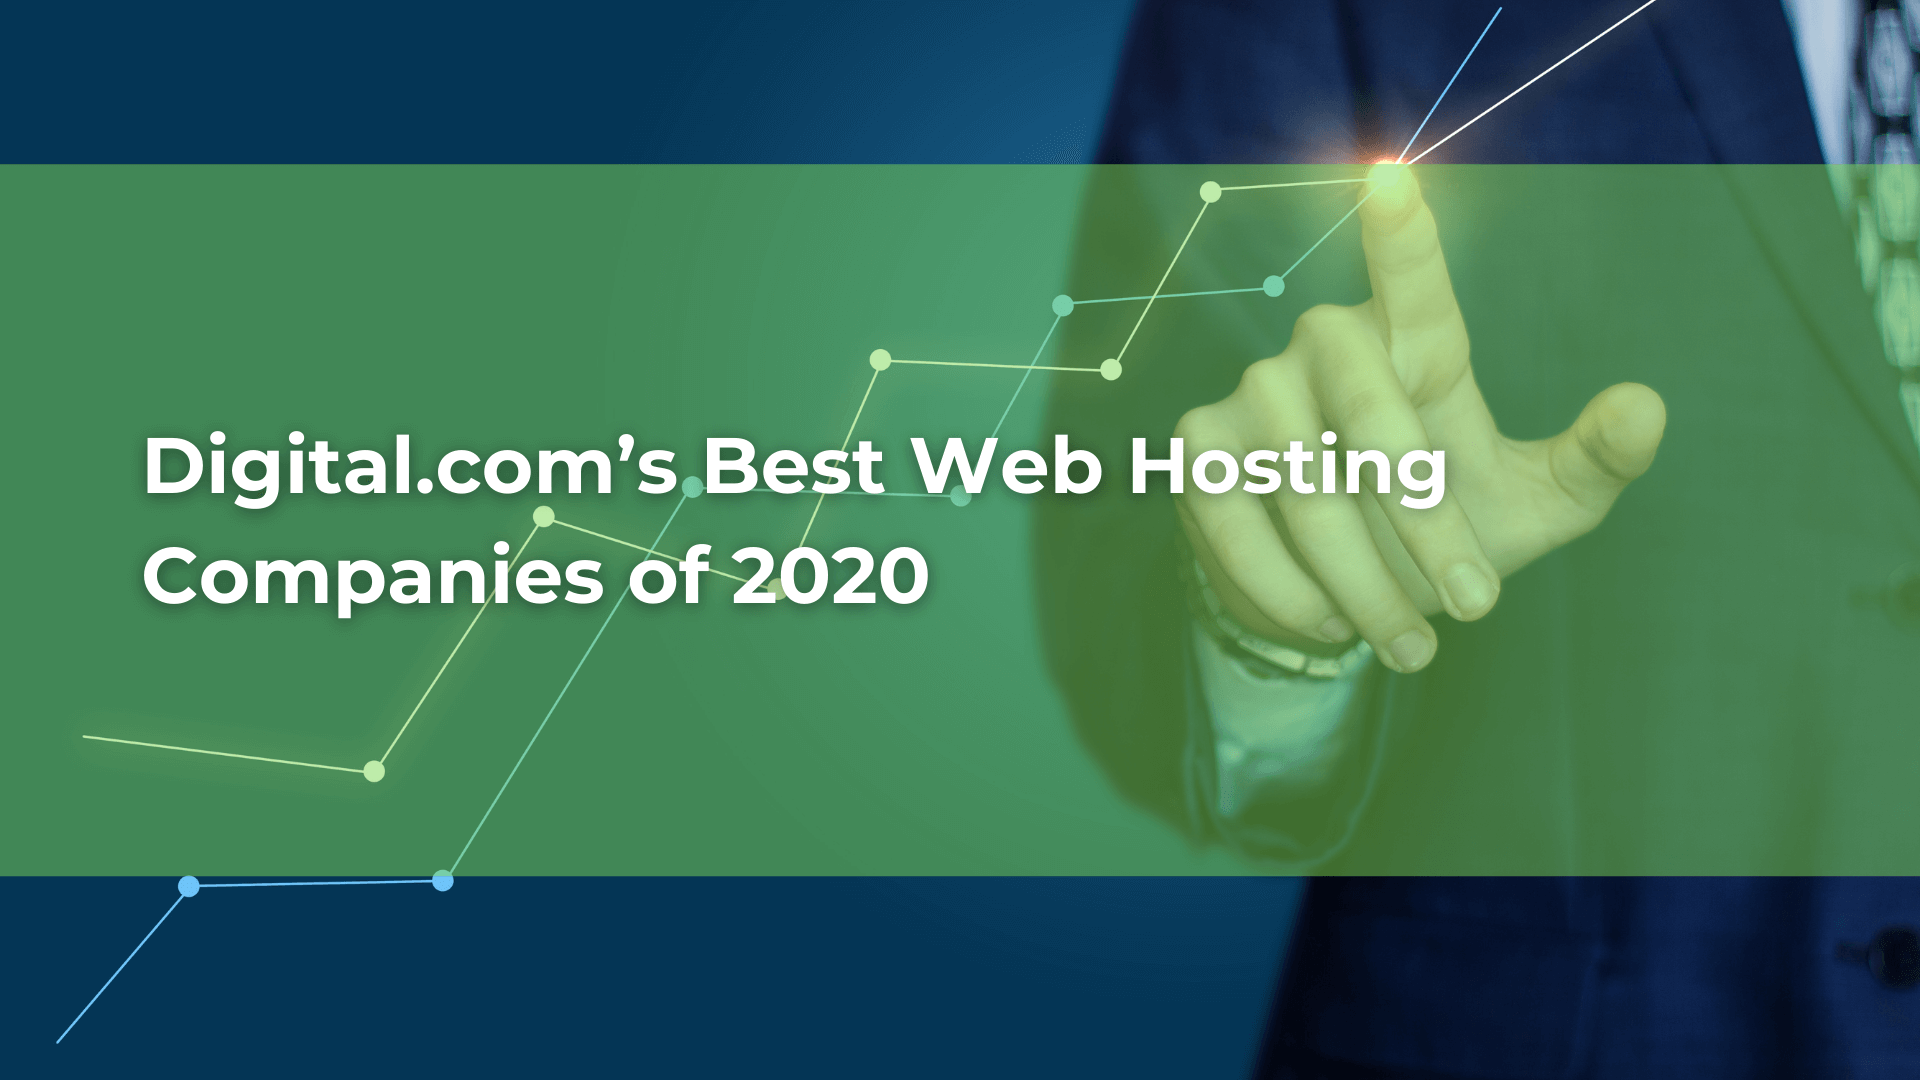 Digital.com's Best Web Hosting Companies of 2020